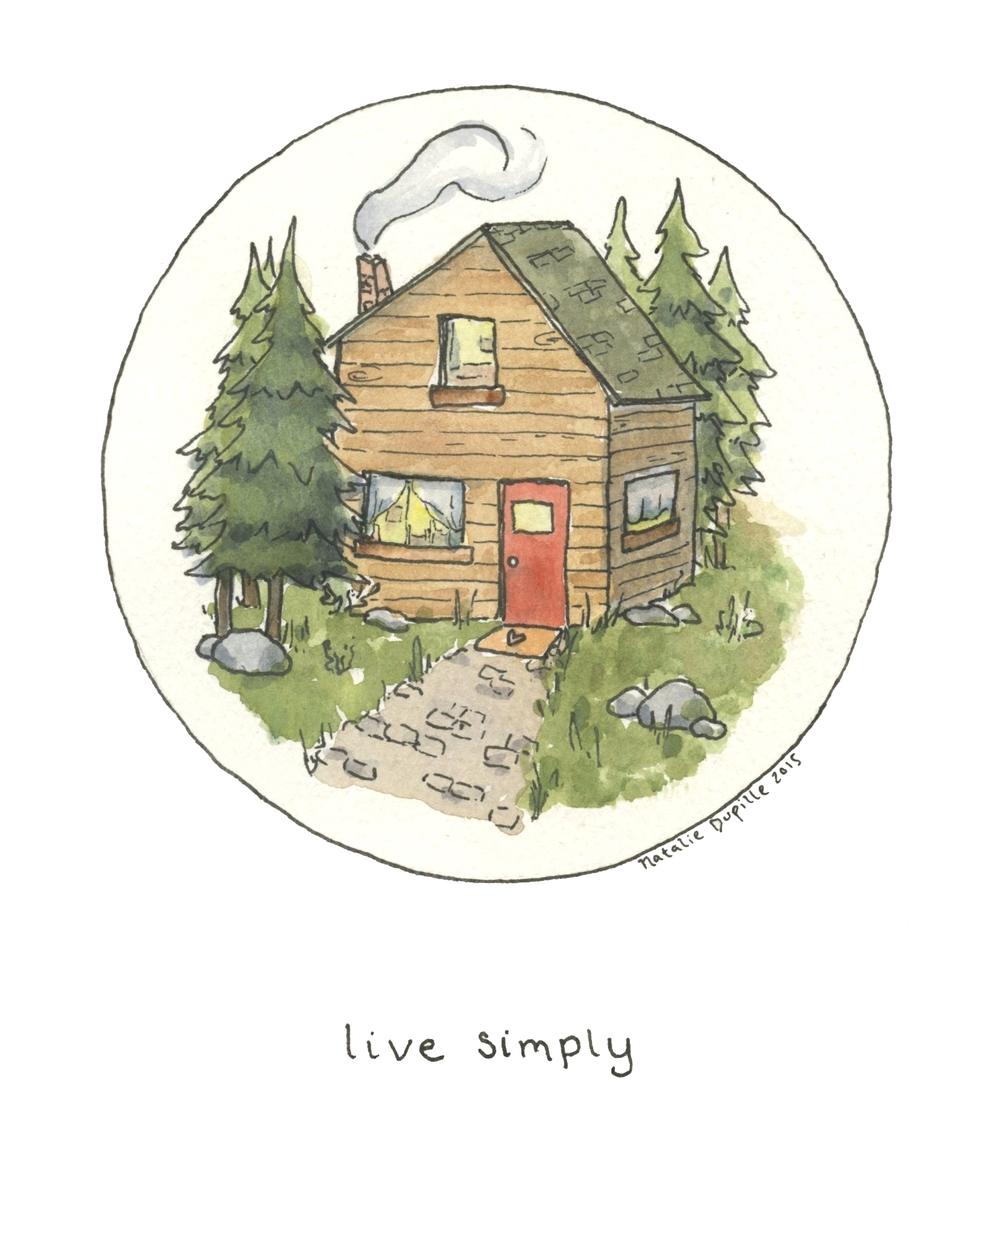 livesimply.jpg